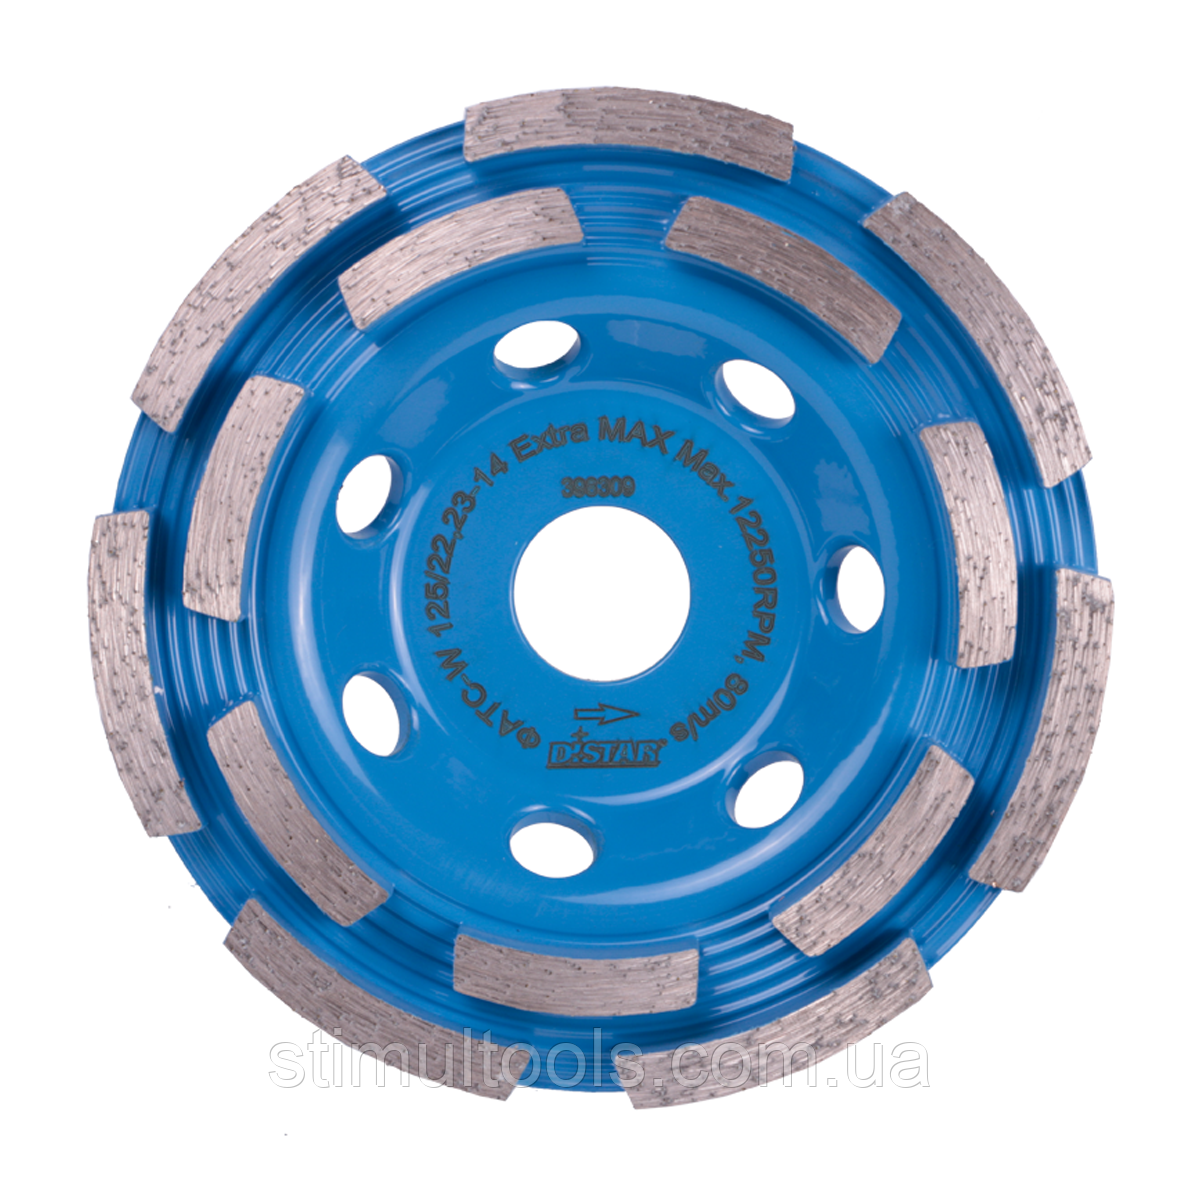 Фреза алмазна по бетону Distar ФАТС-W 125/22,23-7 Raptor